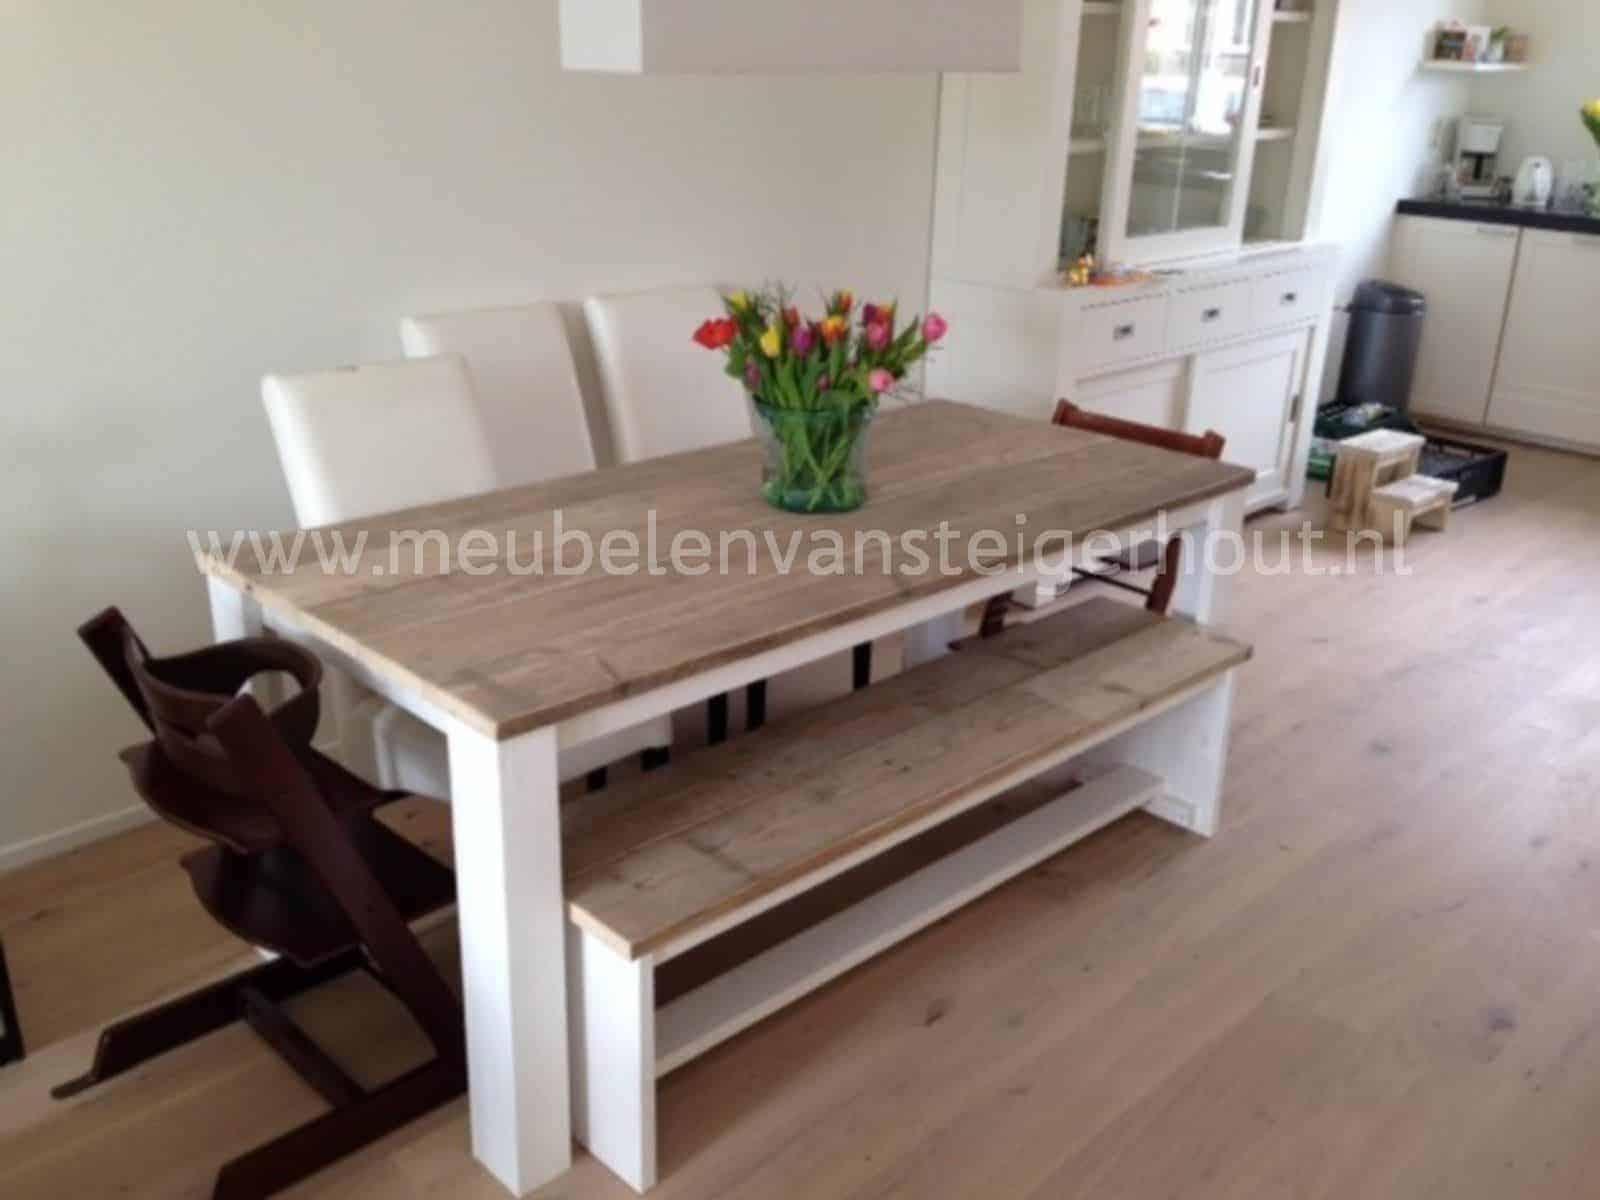 Mooie Steigerhouten Eettafel.Eettafel Standaard Model Meubelen Van Steigerhout